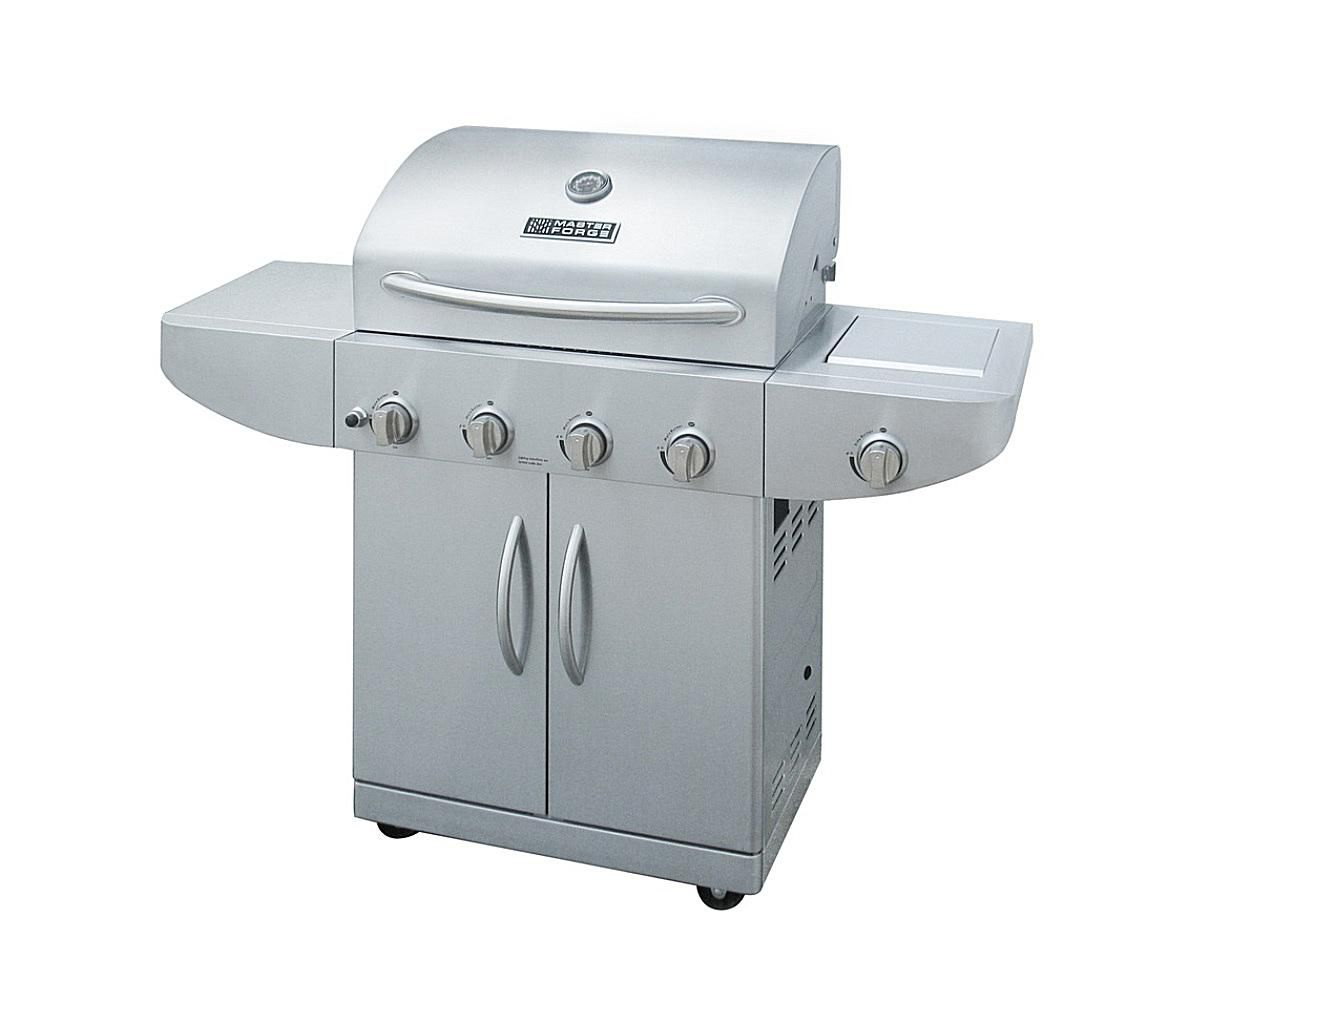 Master forge 5 burner island grill reviews - Master Forge 4 Burner Model 97709 Gas Grill